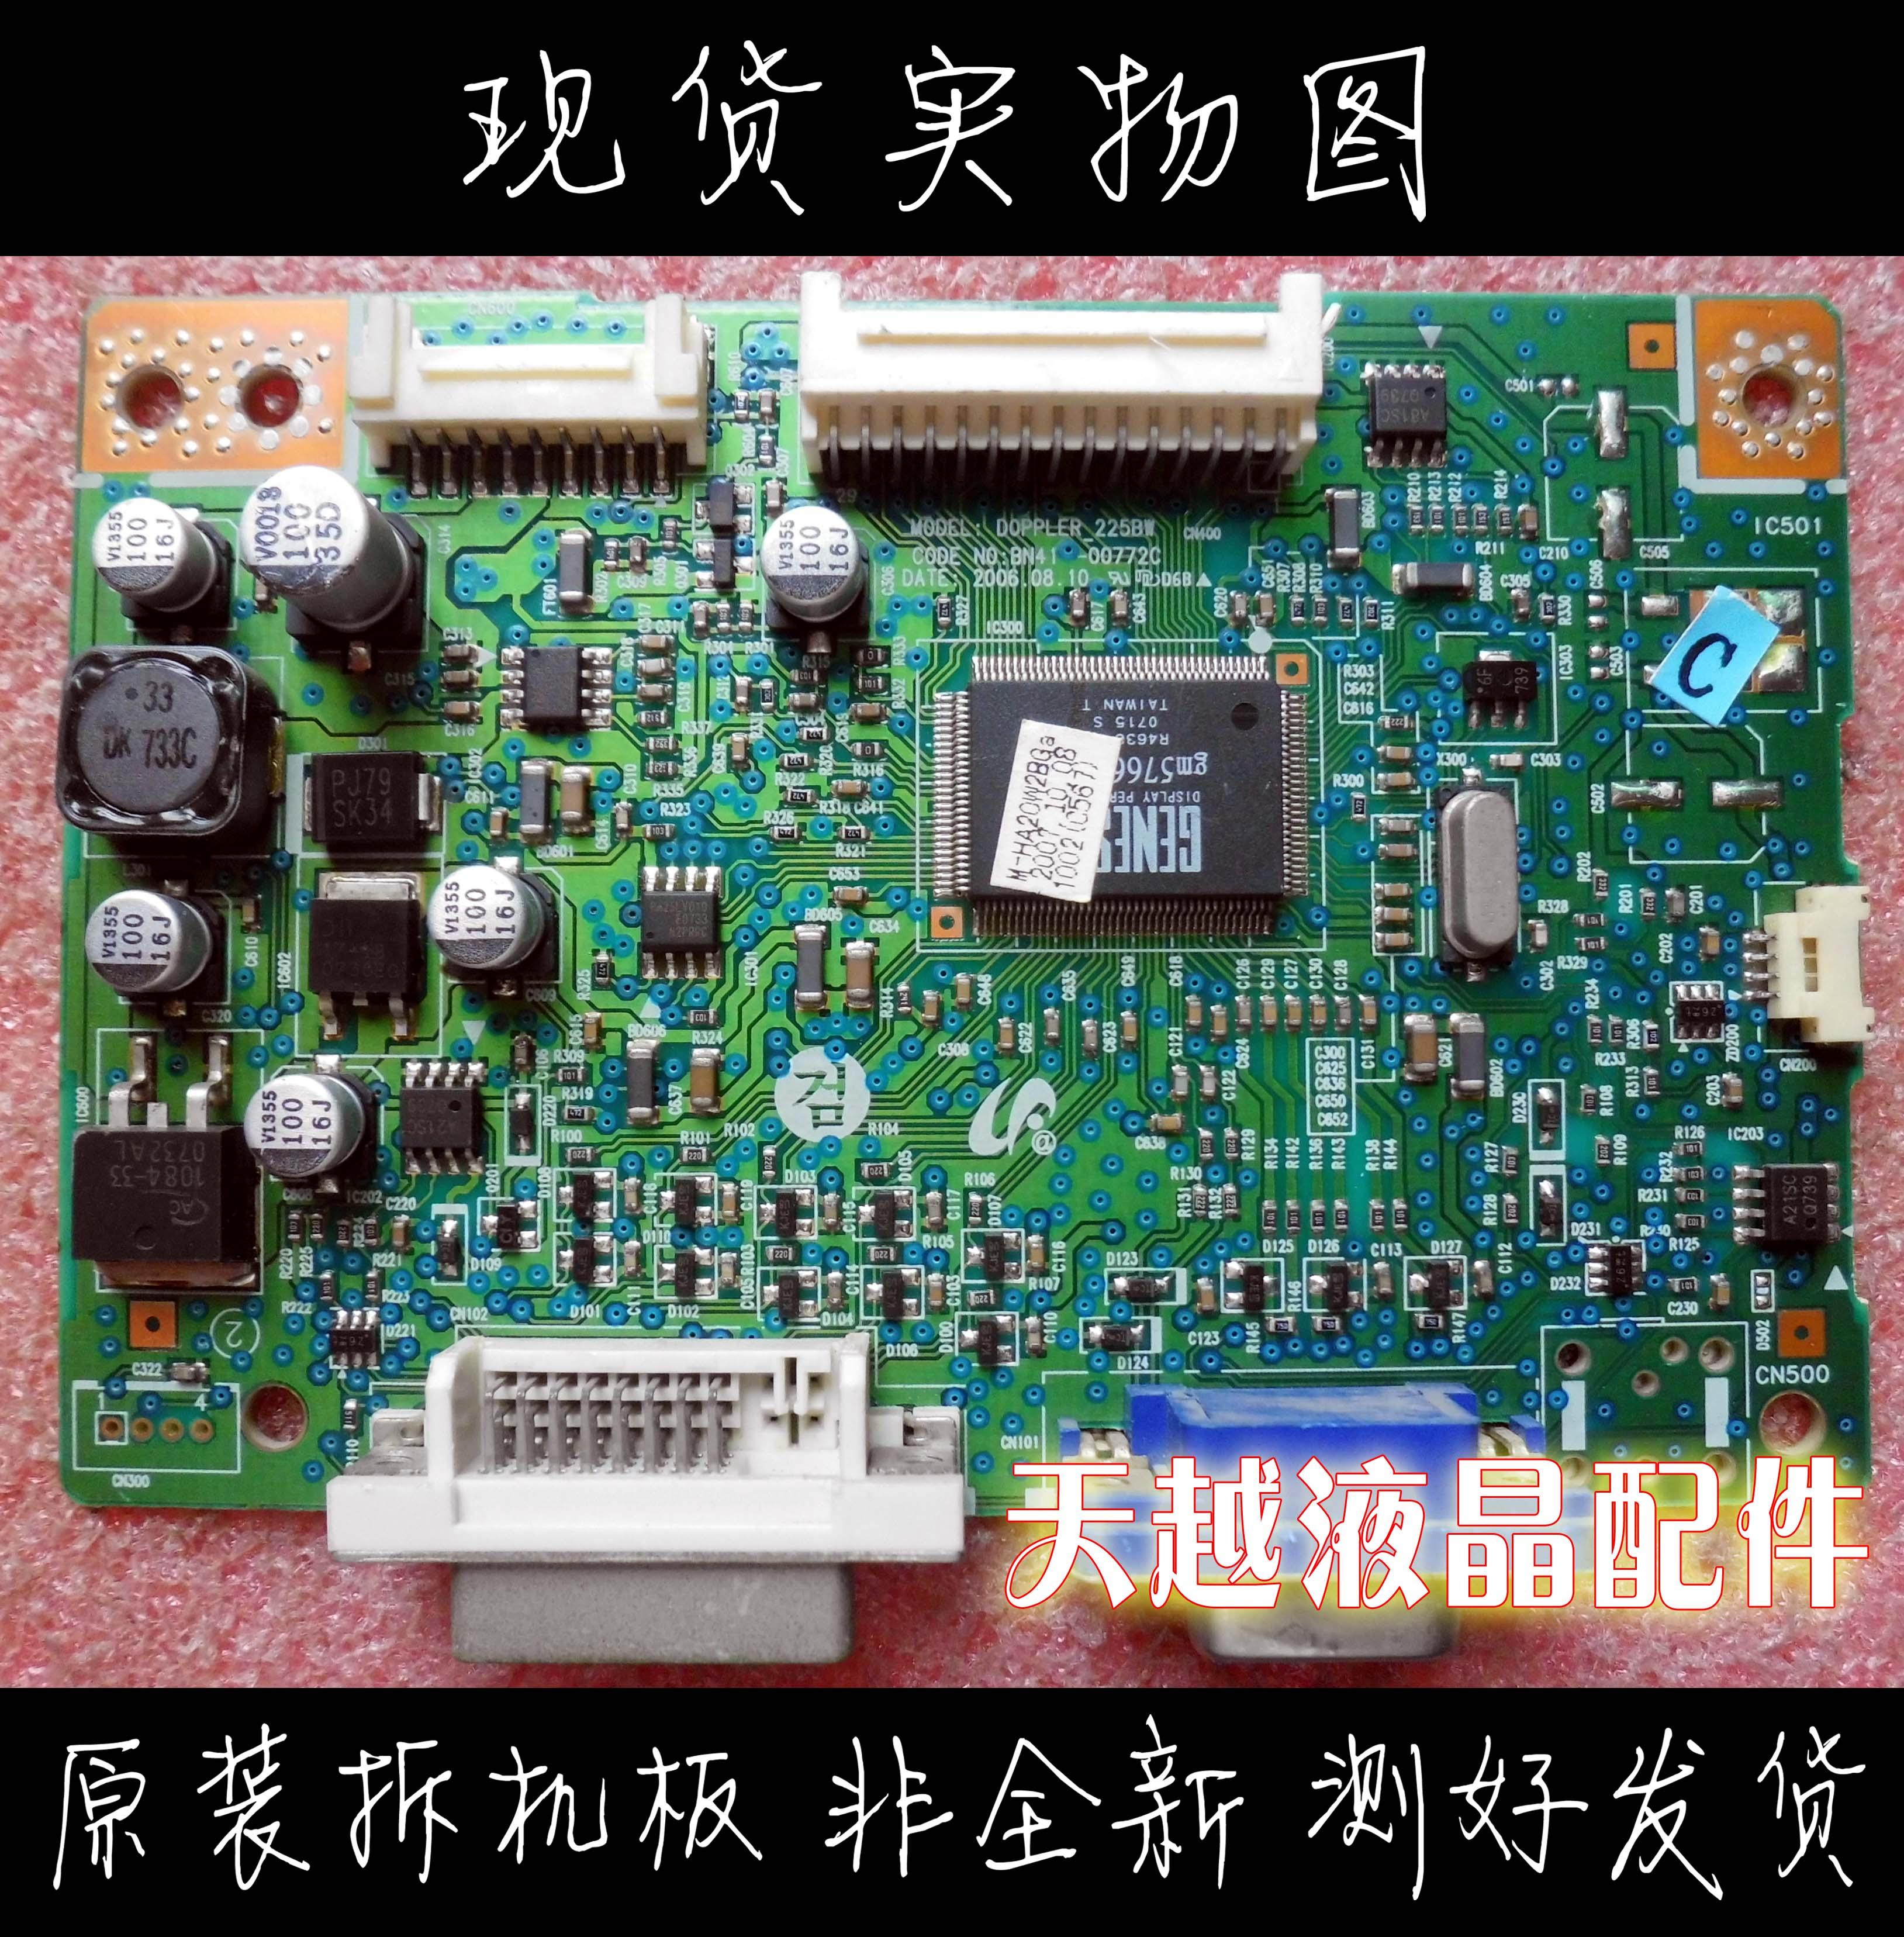 205BW Driven Plate 225BW Motherboard Samsung 205BW LCD Driver Board BN41-00772B/C